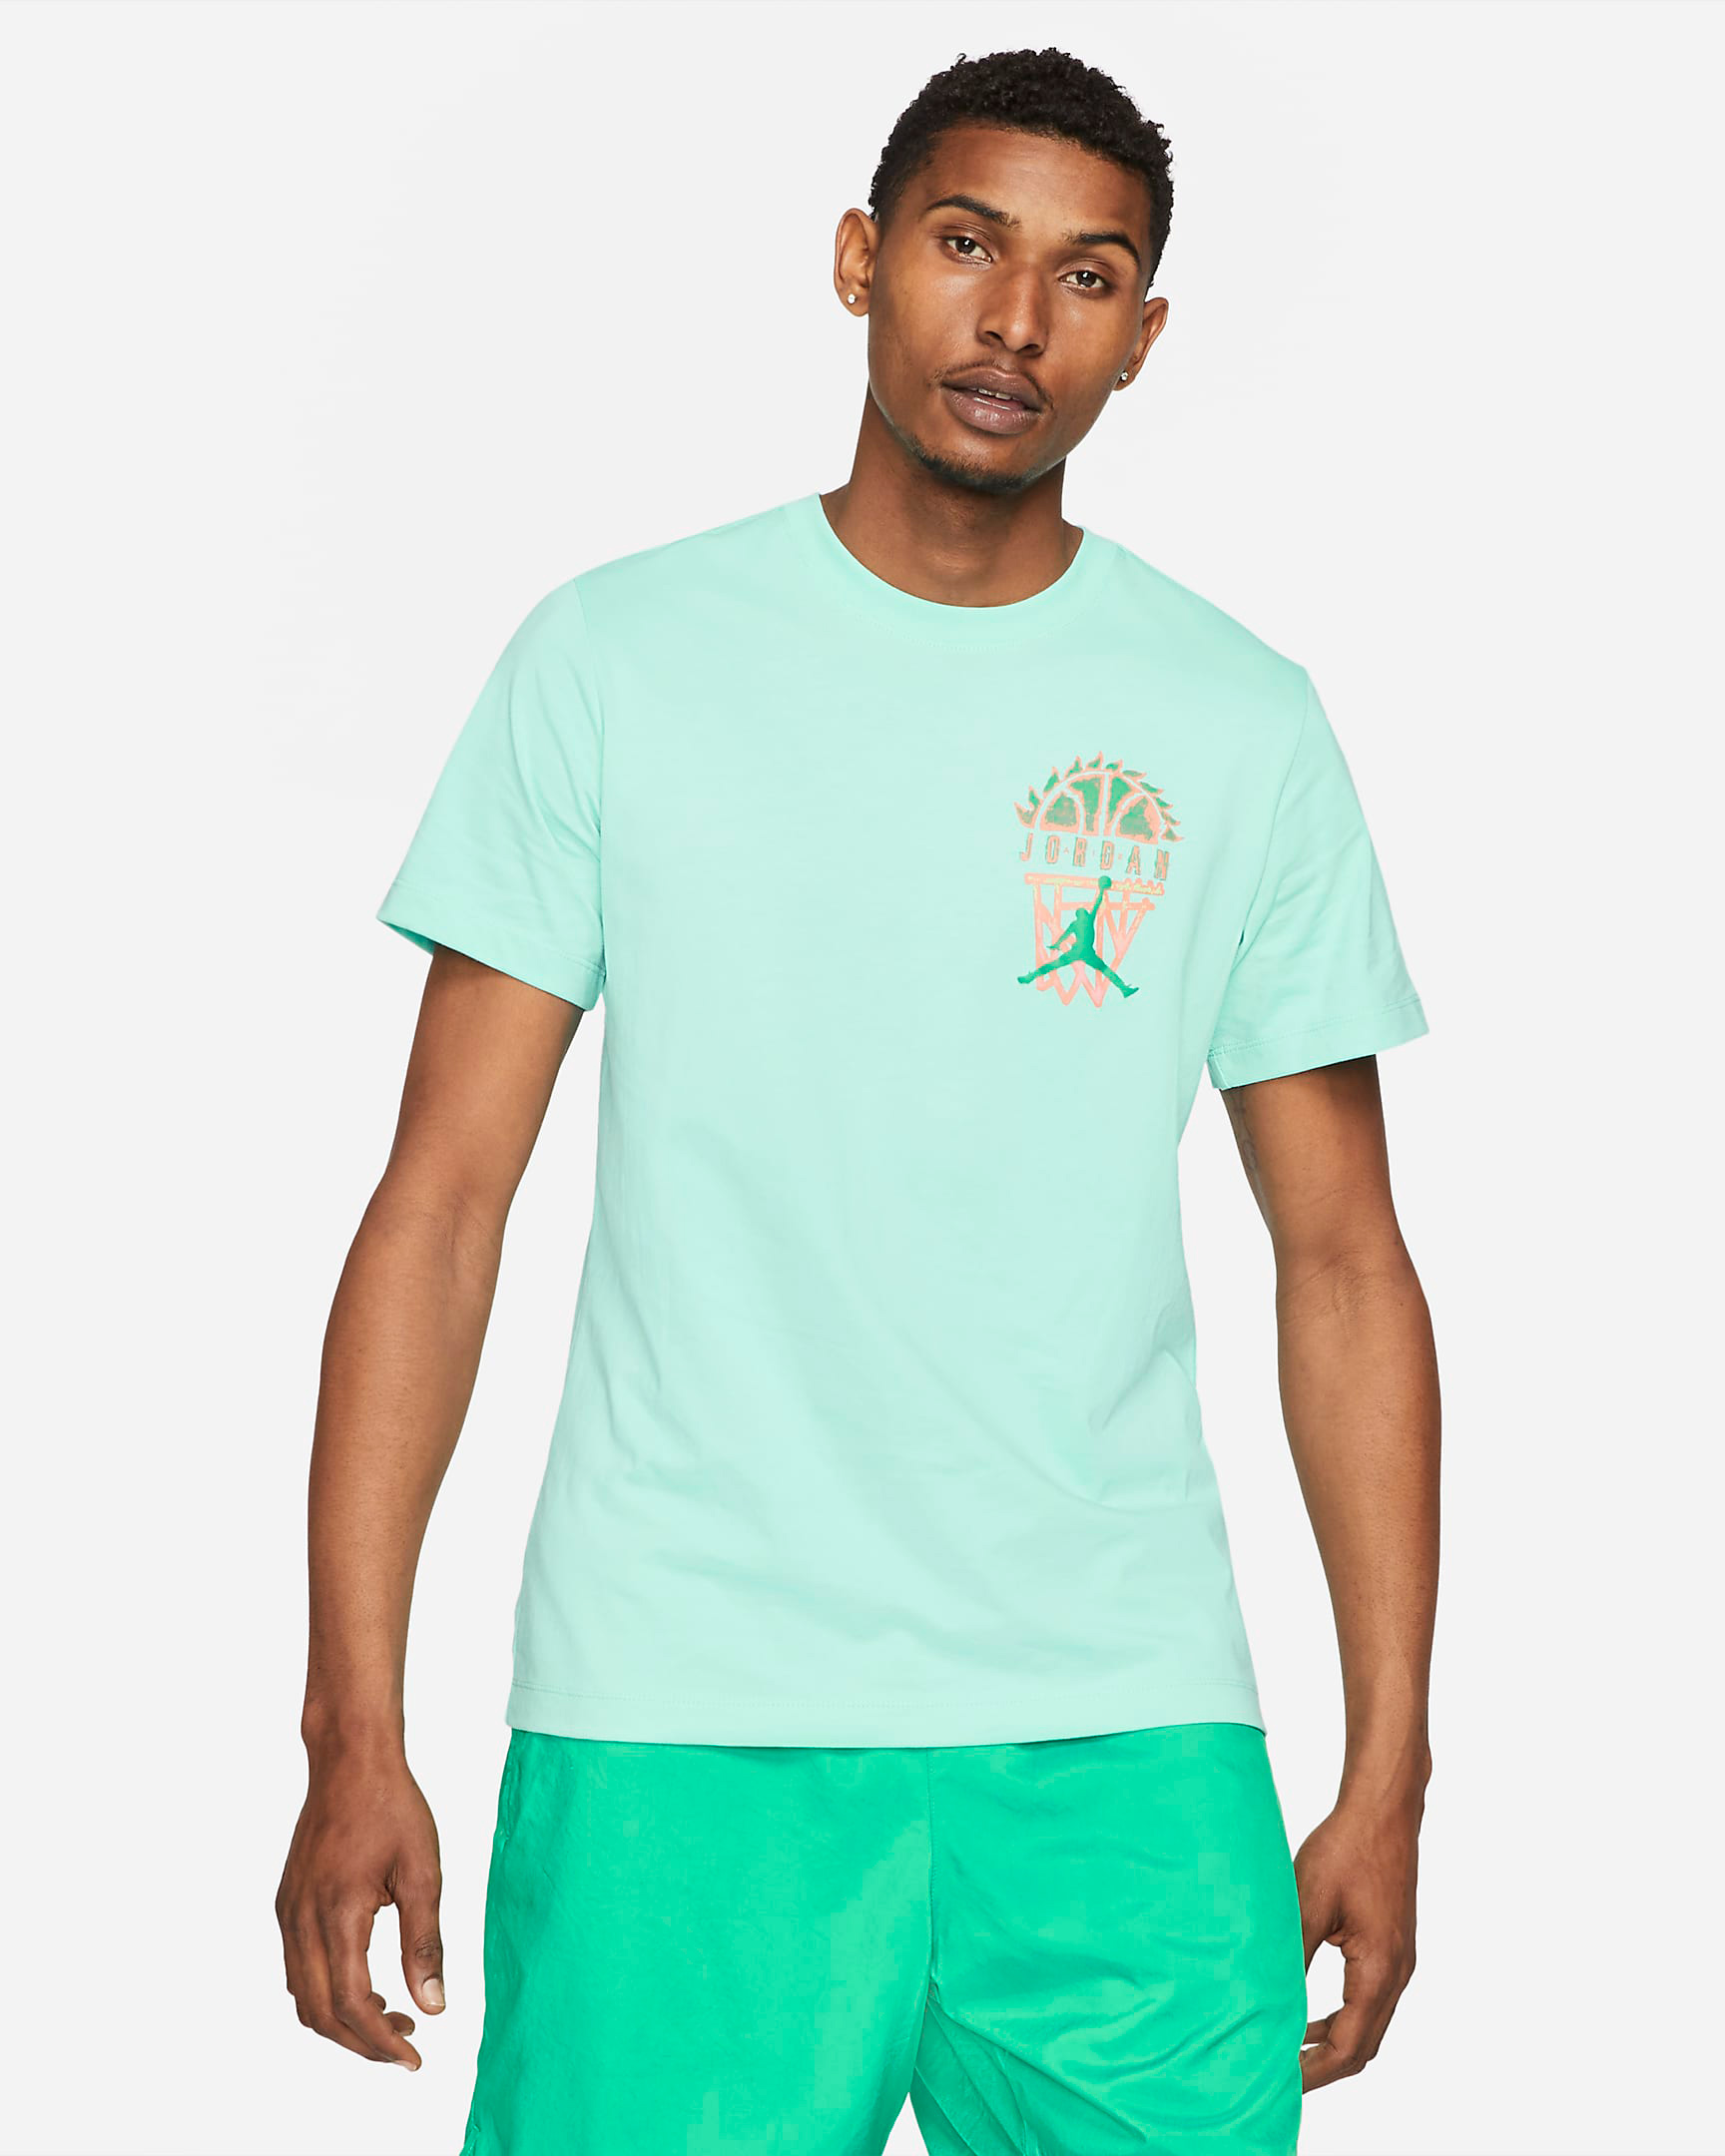 jordan-tropical-twist-sport-dna-shirt-1